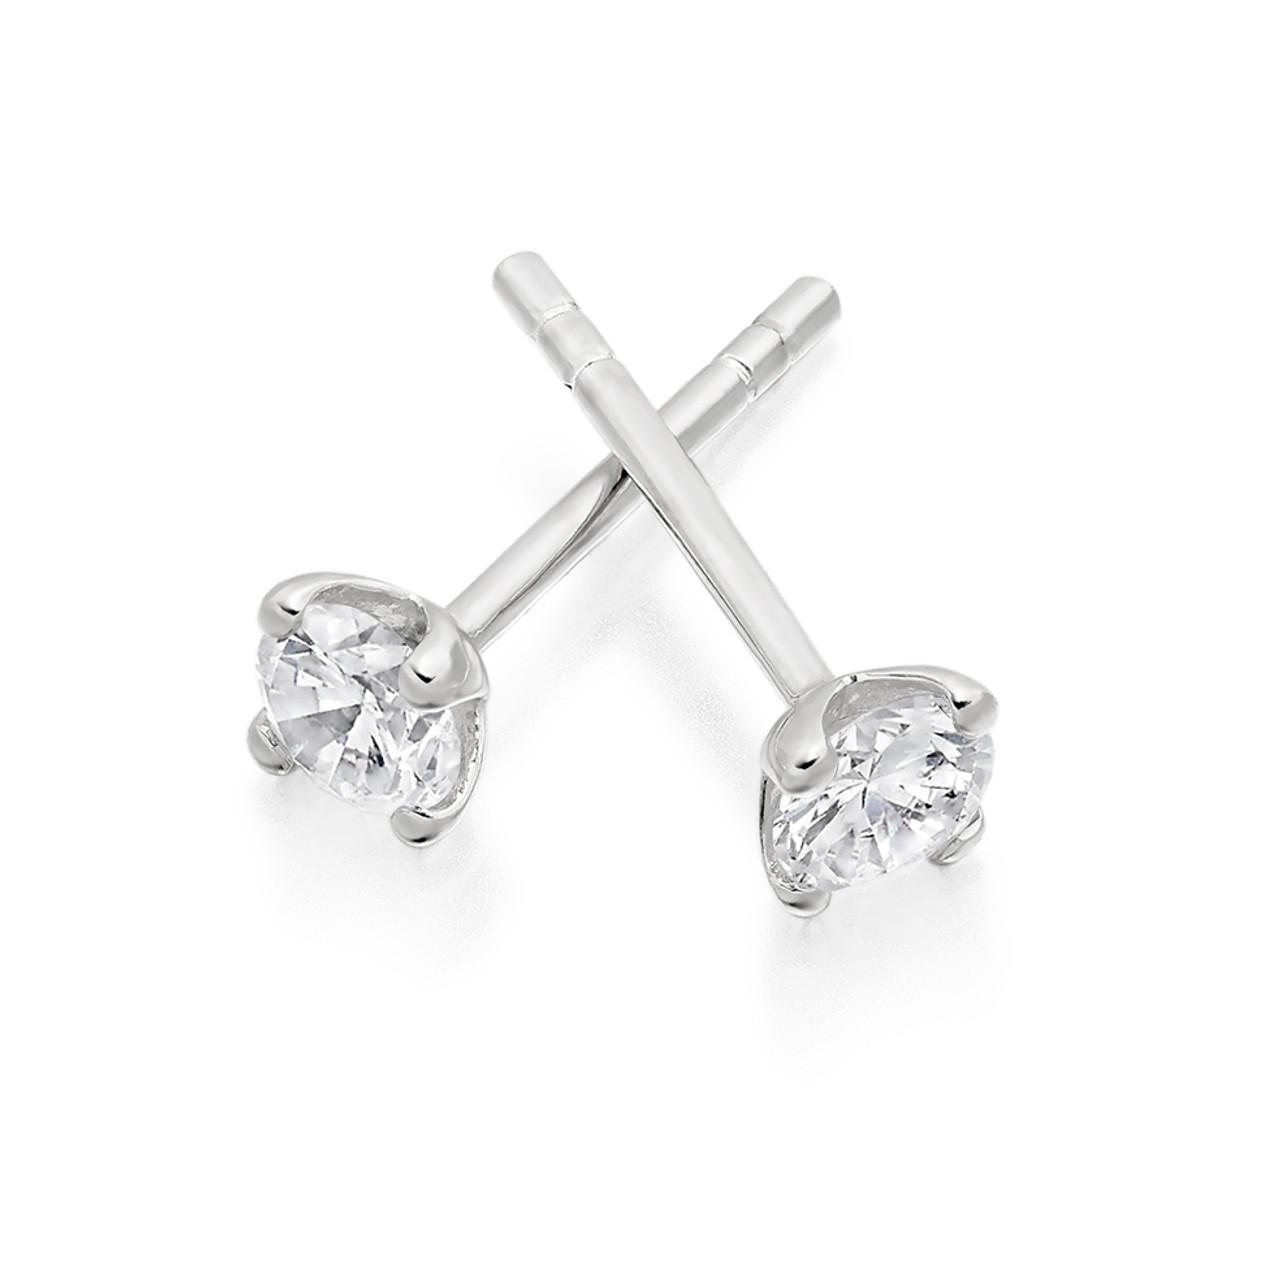 18ct White Gold 0.40ct Diamond Stud Earrings